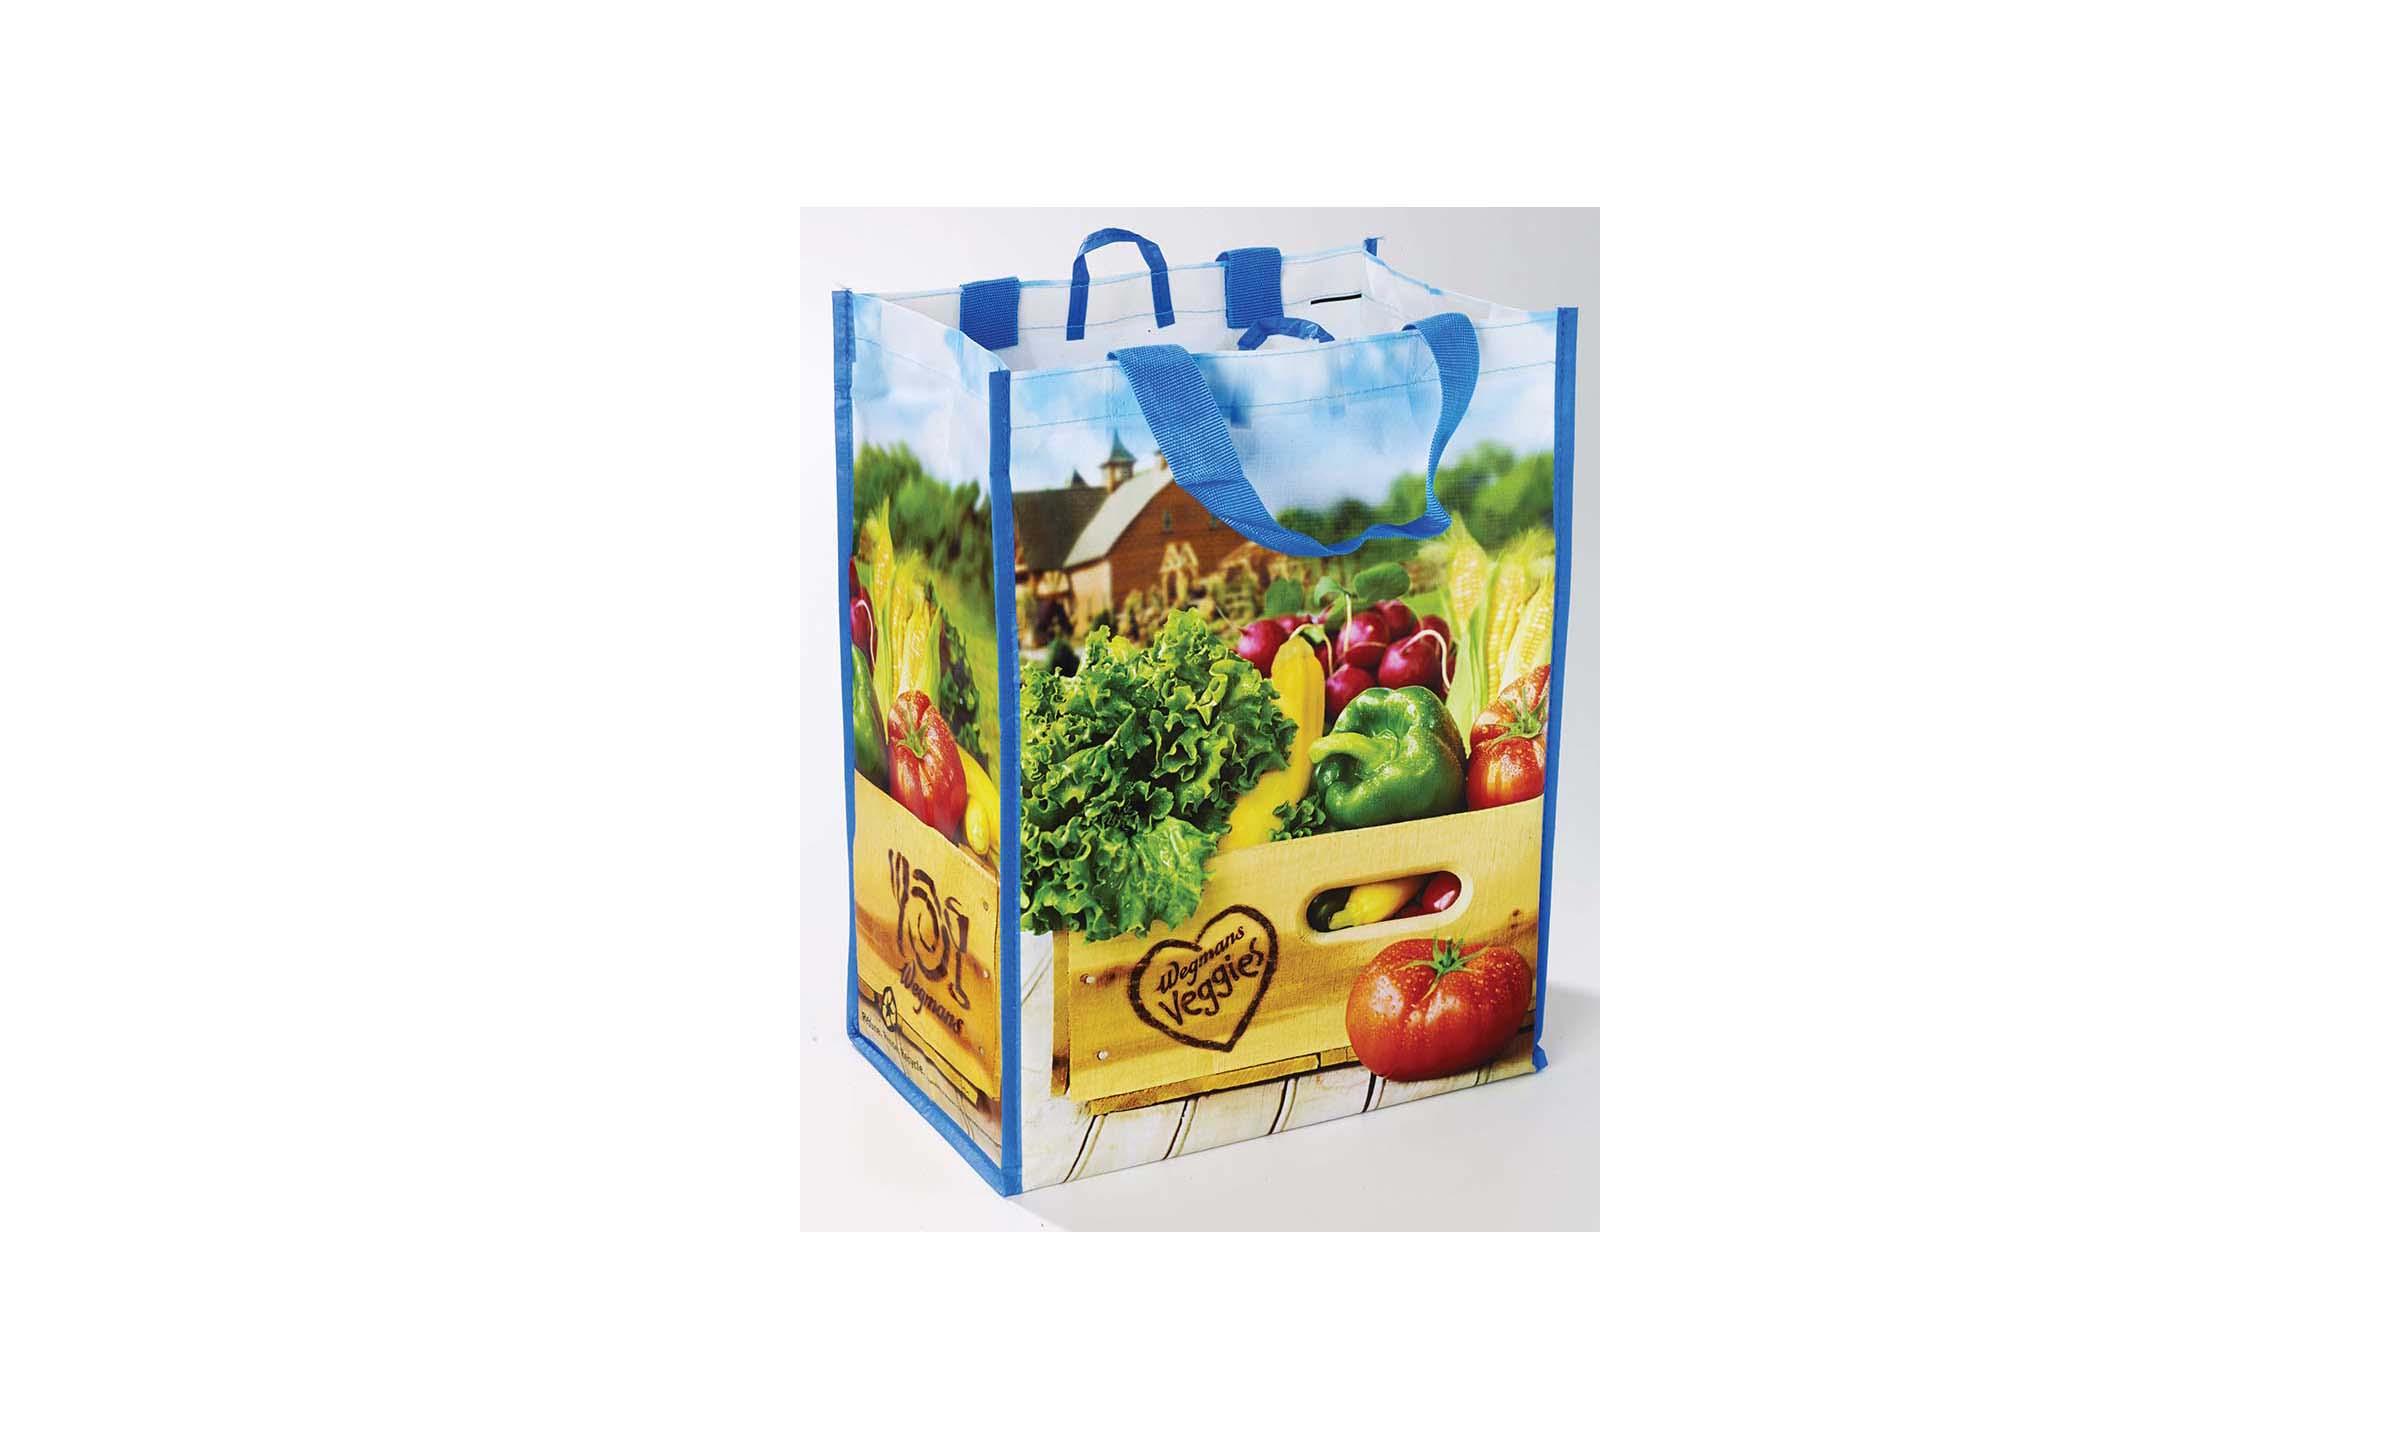 Wegman's reusable bag